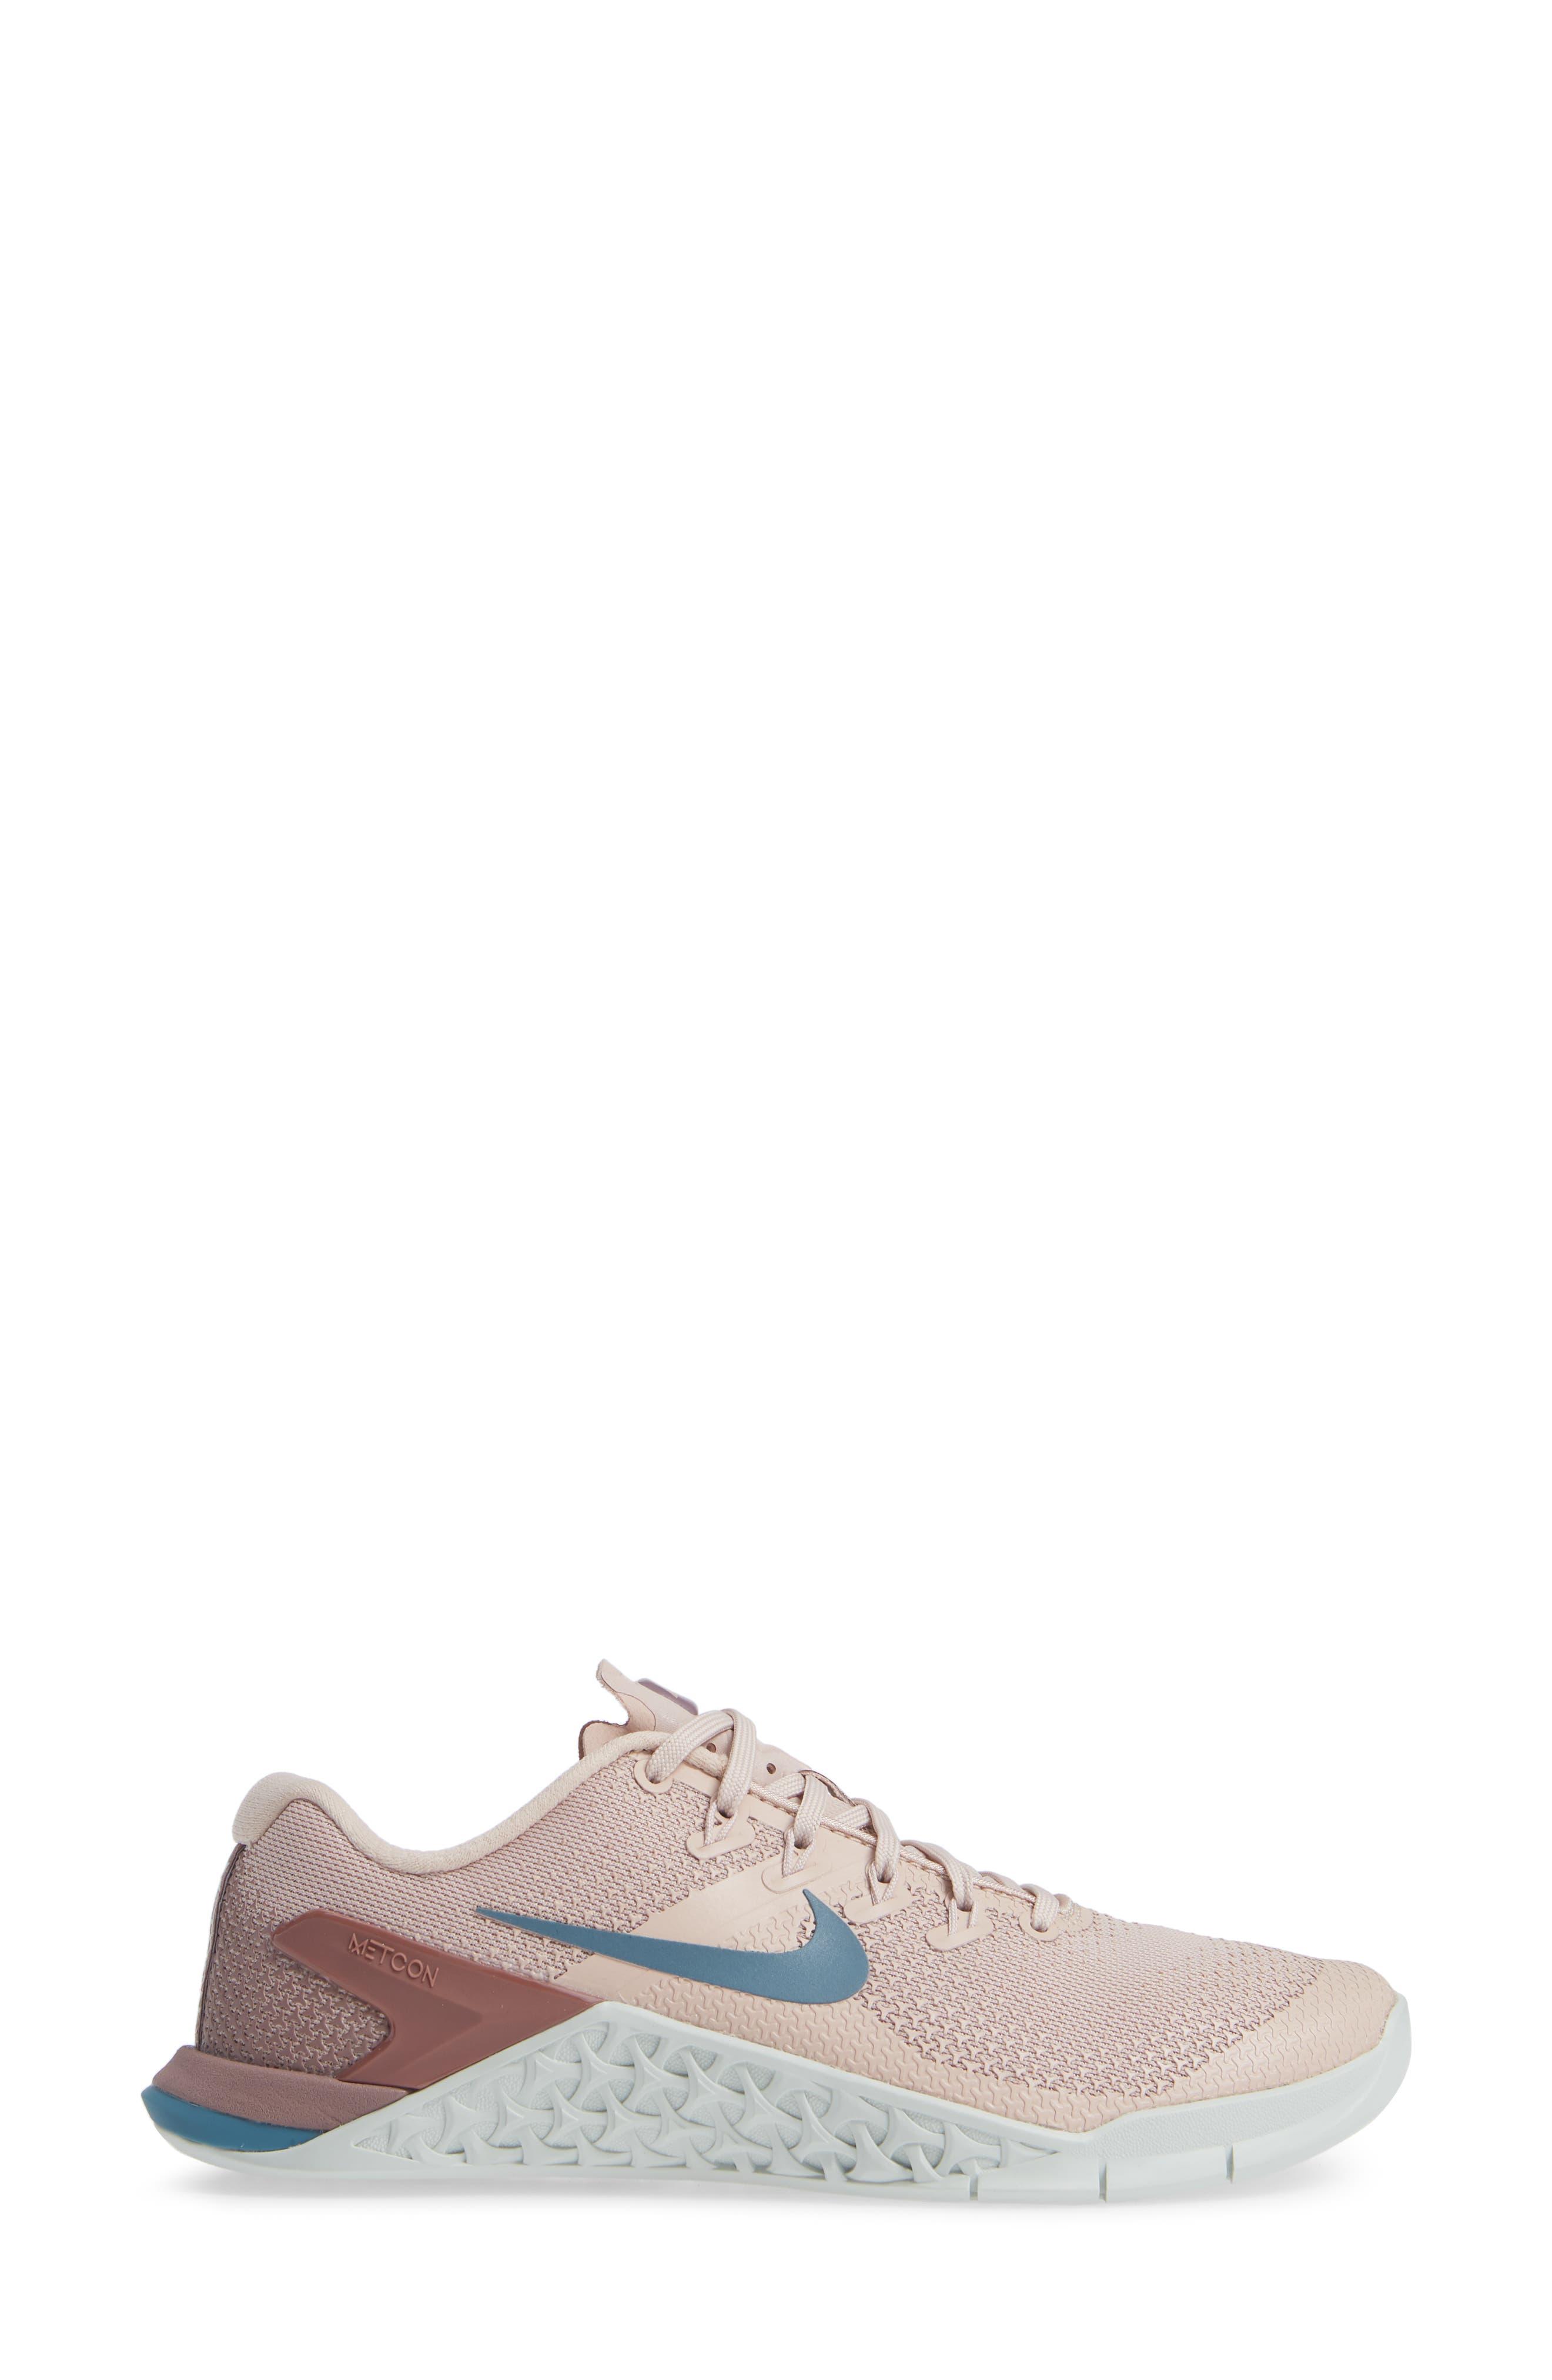 Metcon 4 Training Shoe,                             Alternate thumbnail 3, color,                             PARTICLE BEIGE